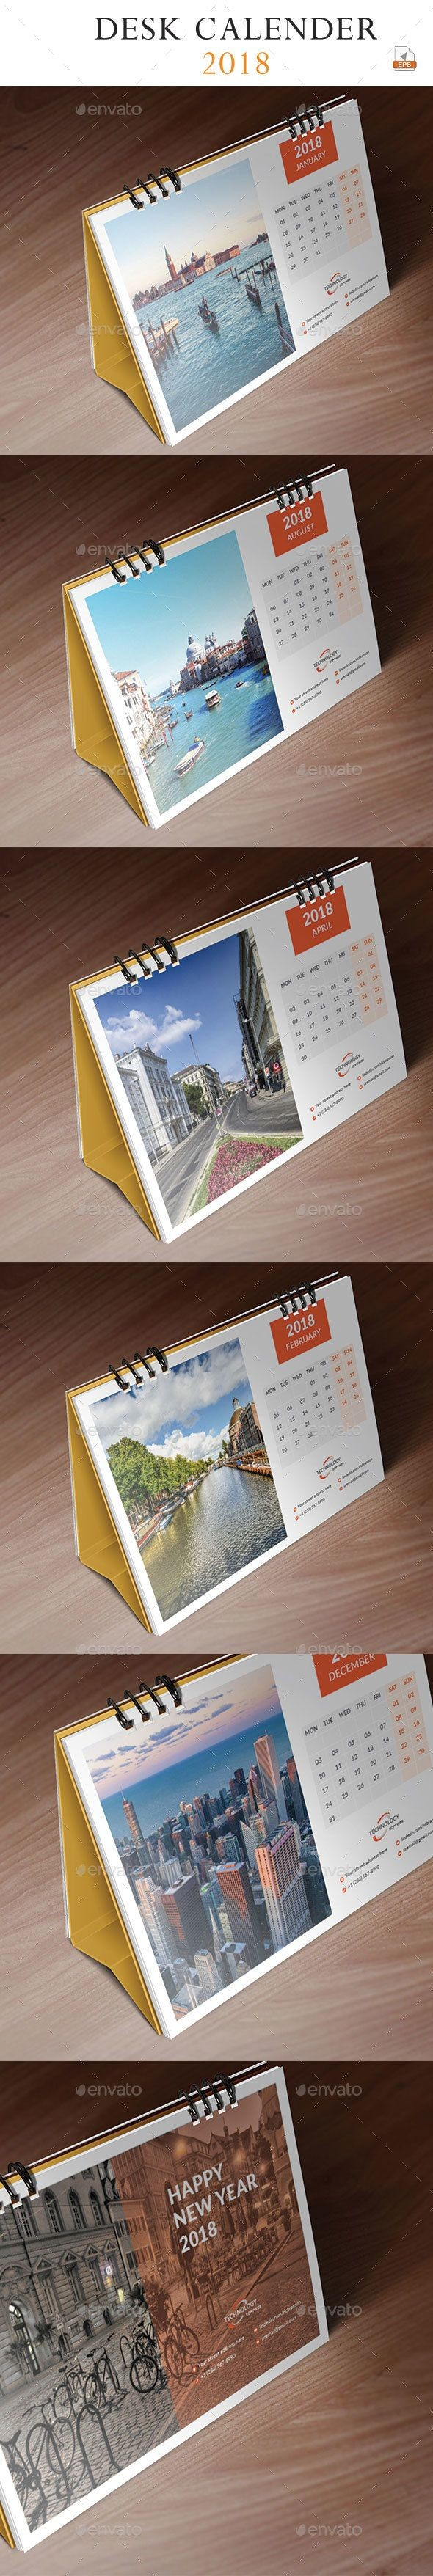 23 best calendar 2013 images on Pinterest